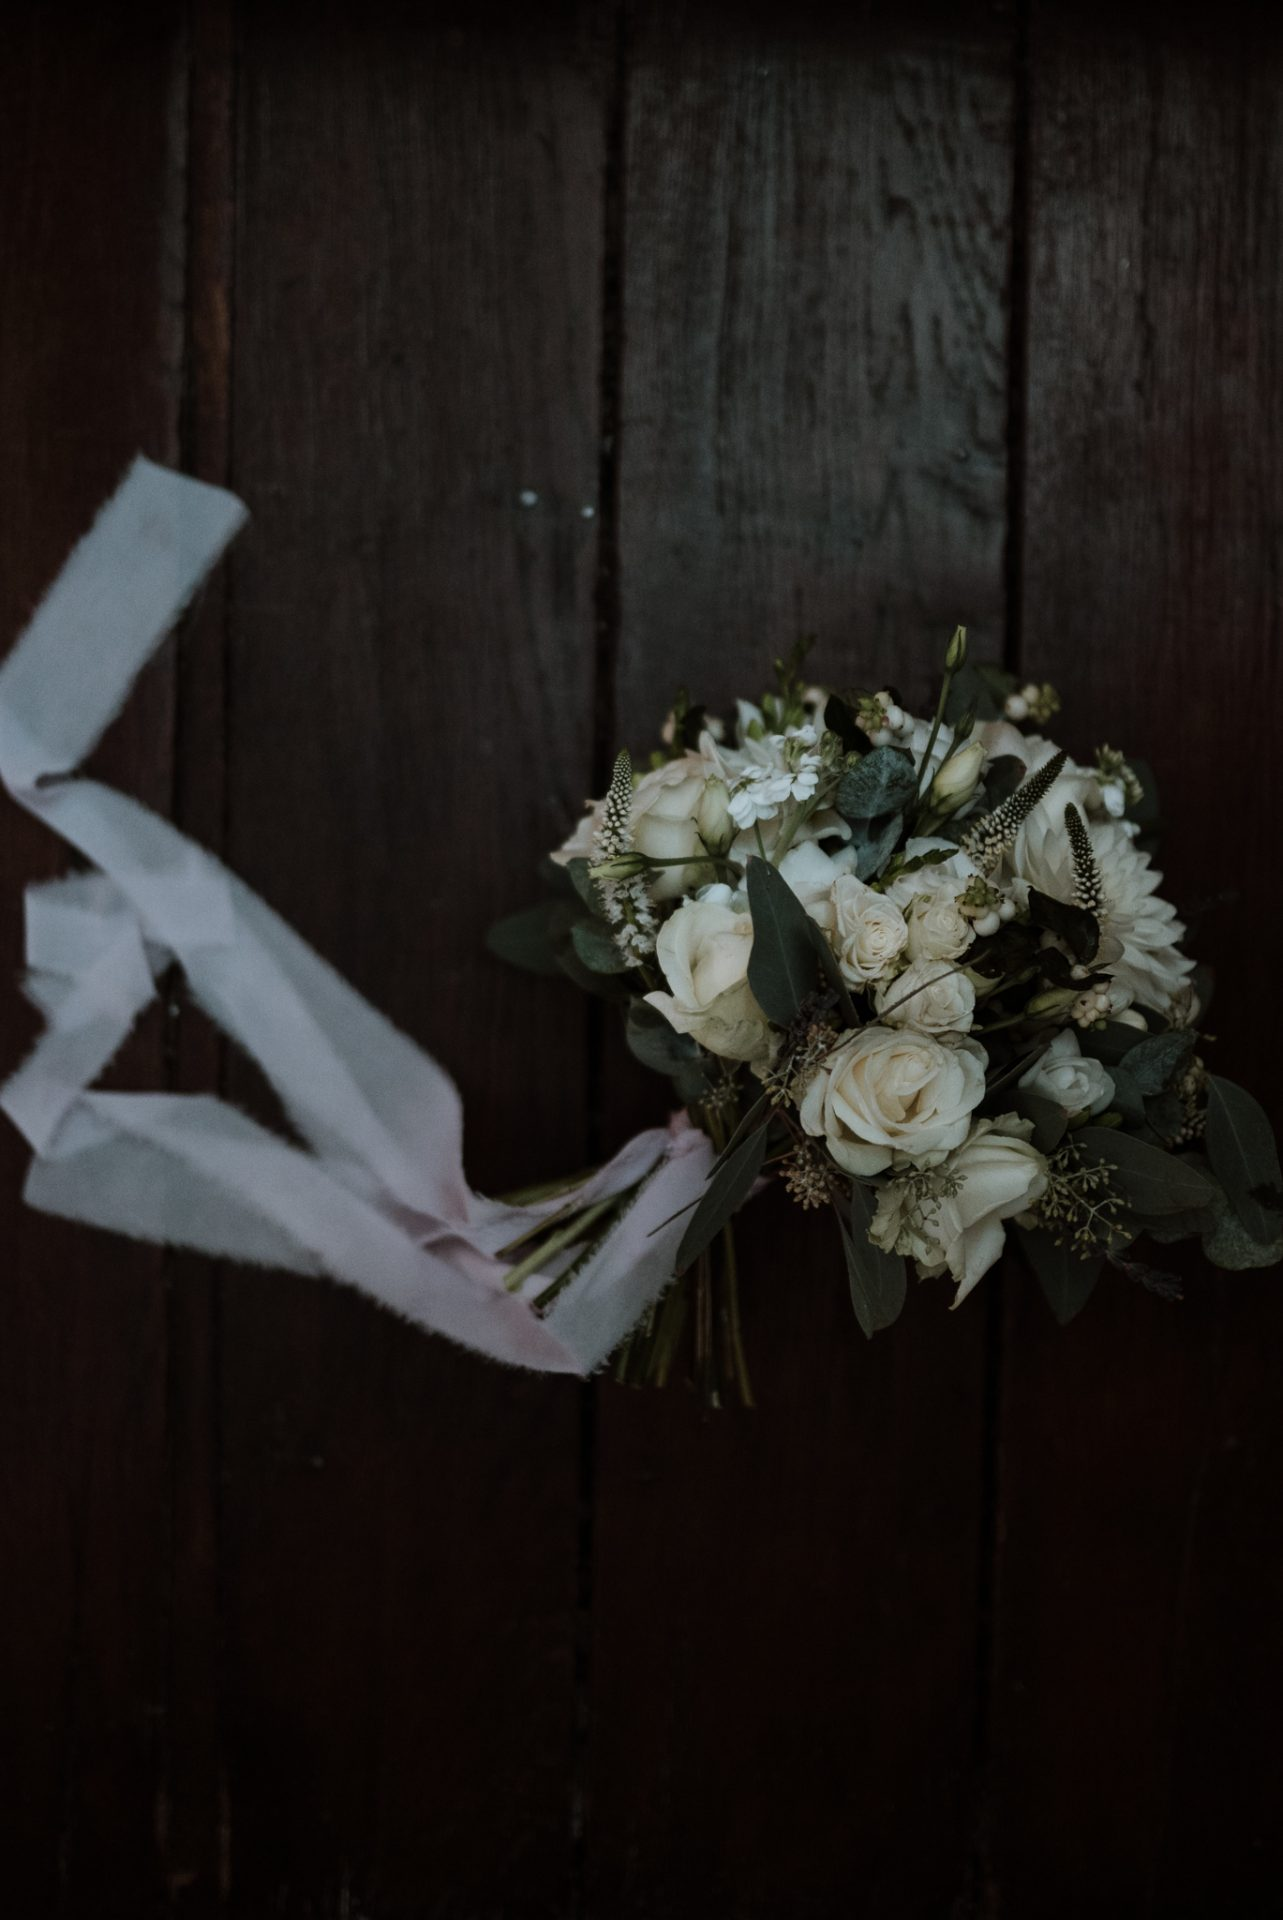 daisy lane floral design bouquet on wooden floor